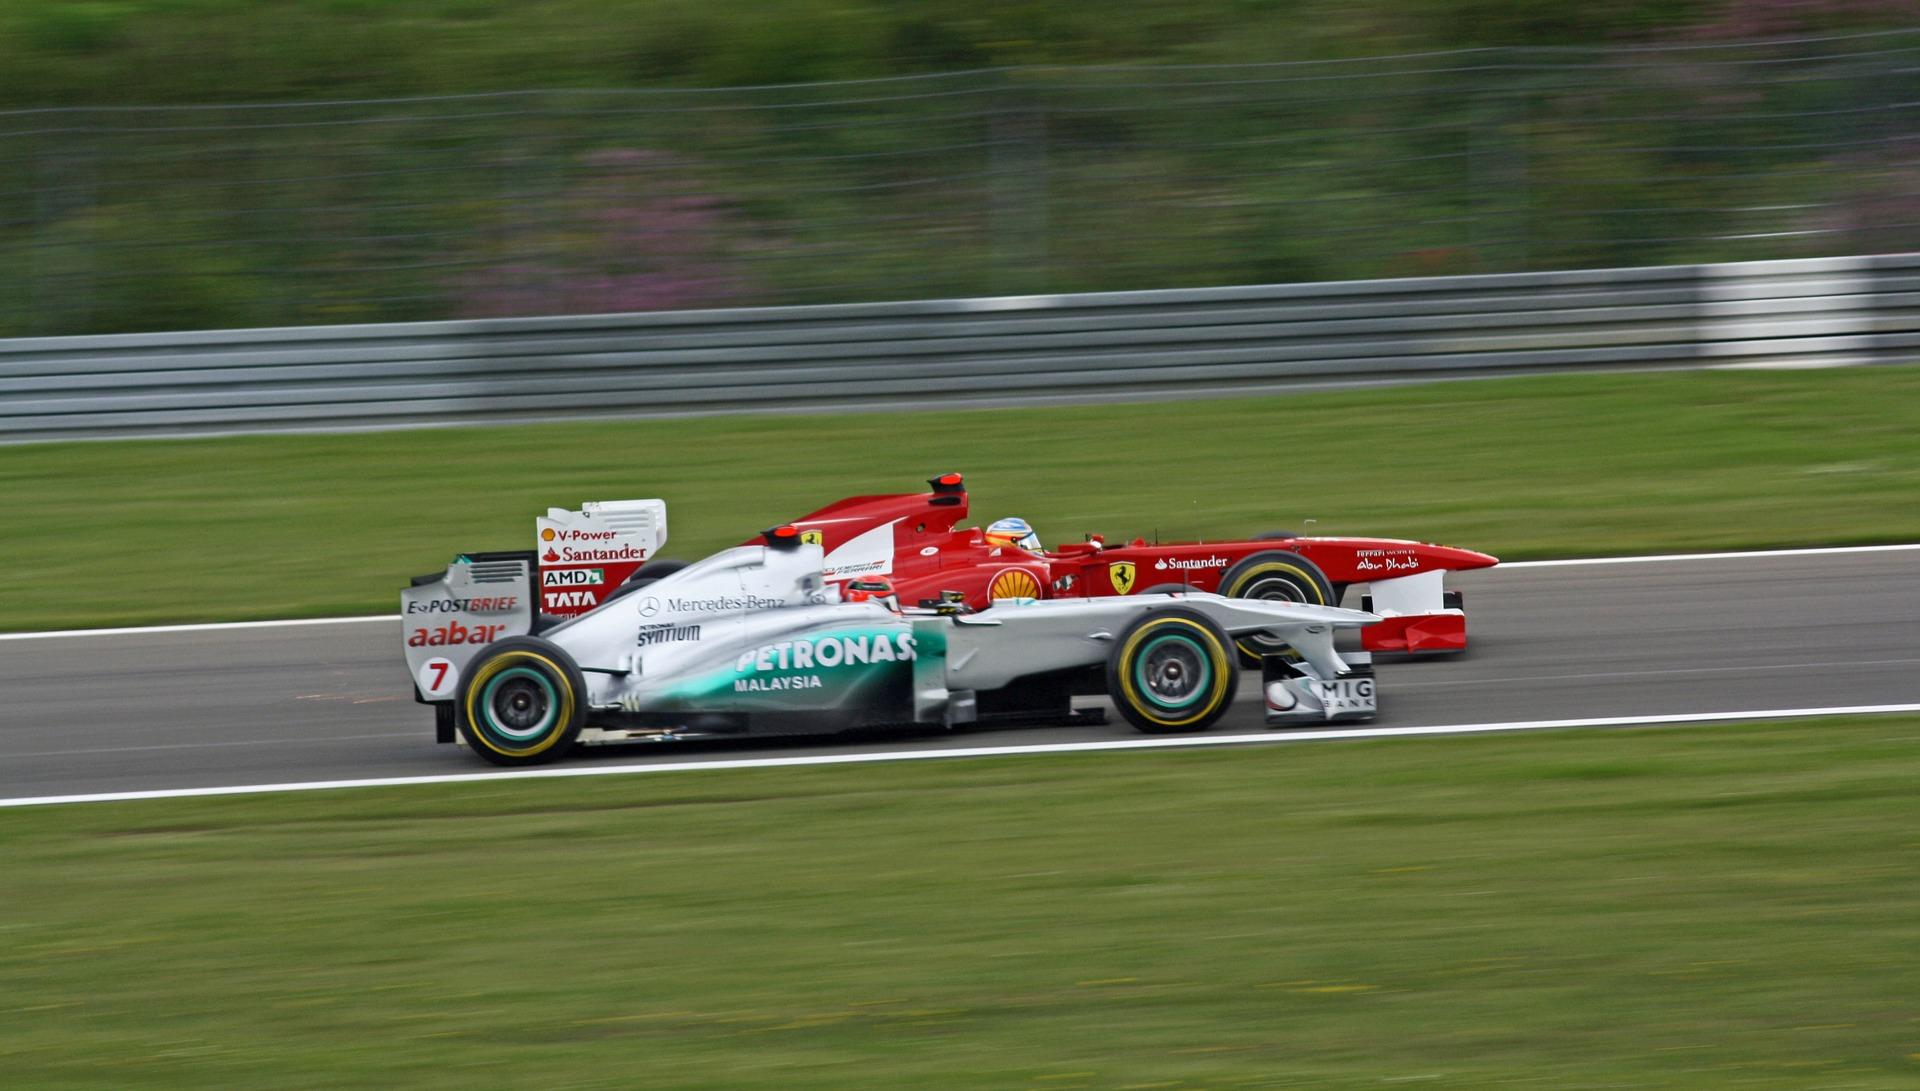 Crypto Exchange Crypto.com Signs Global Sponsorship With Formula 1